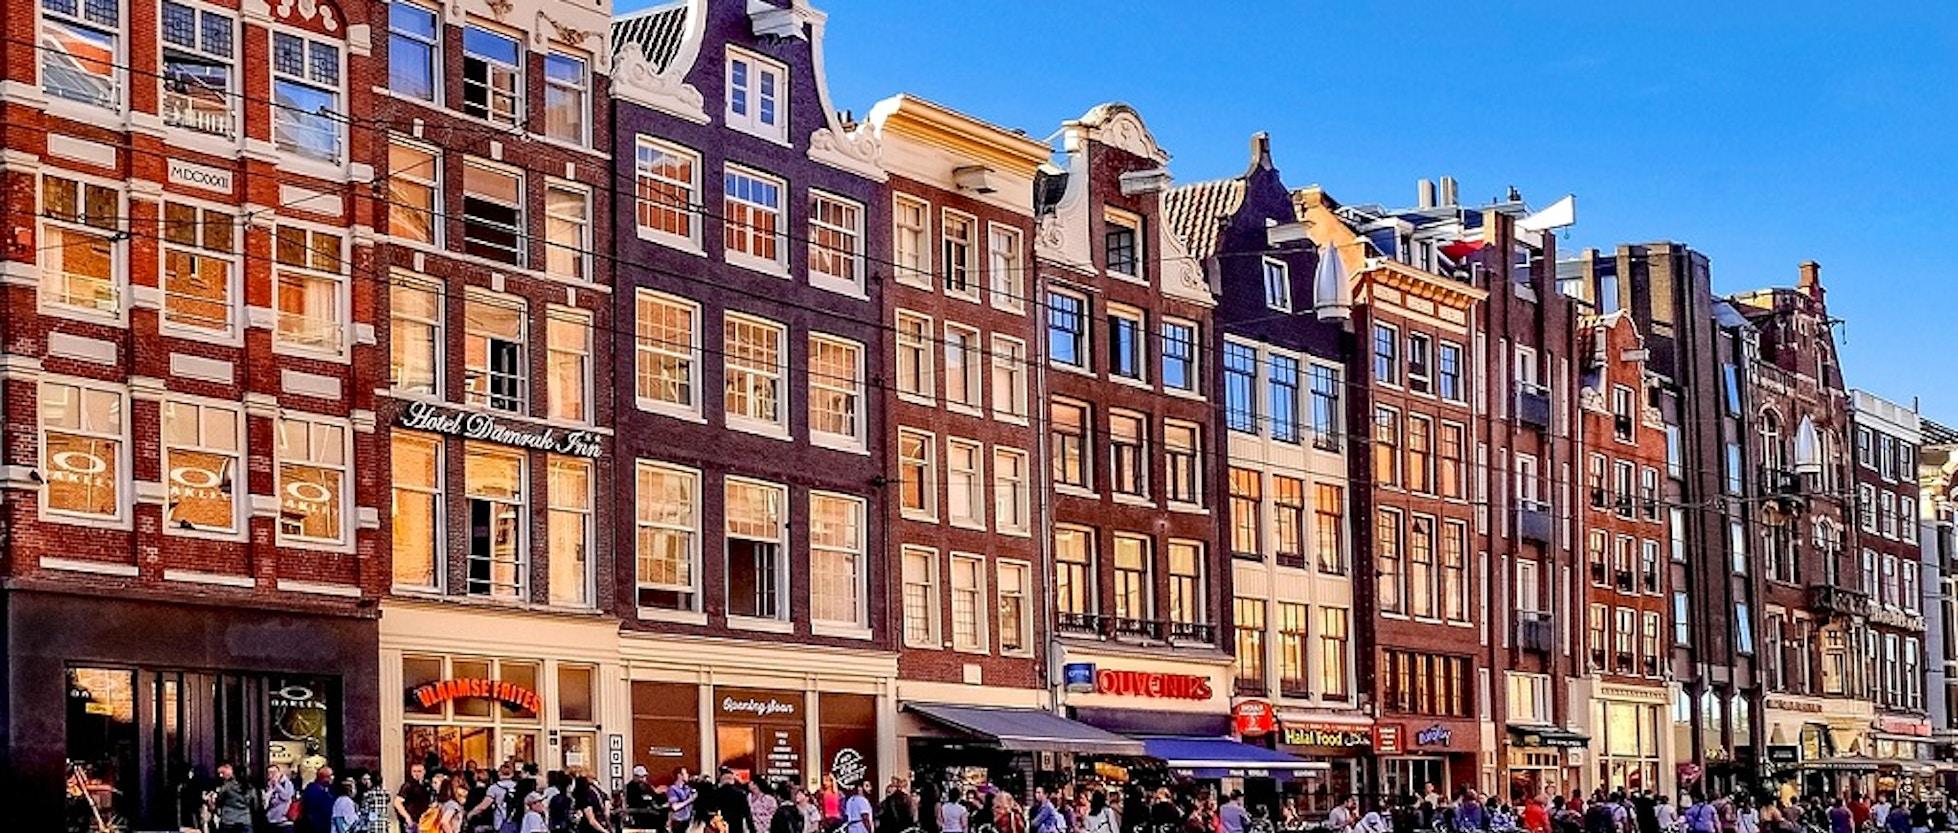 tassa turistica ad amsterdam pu aumentare fino a 10 a notte